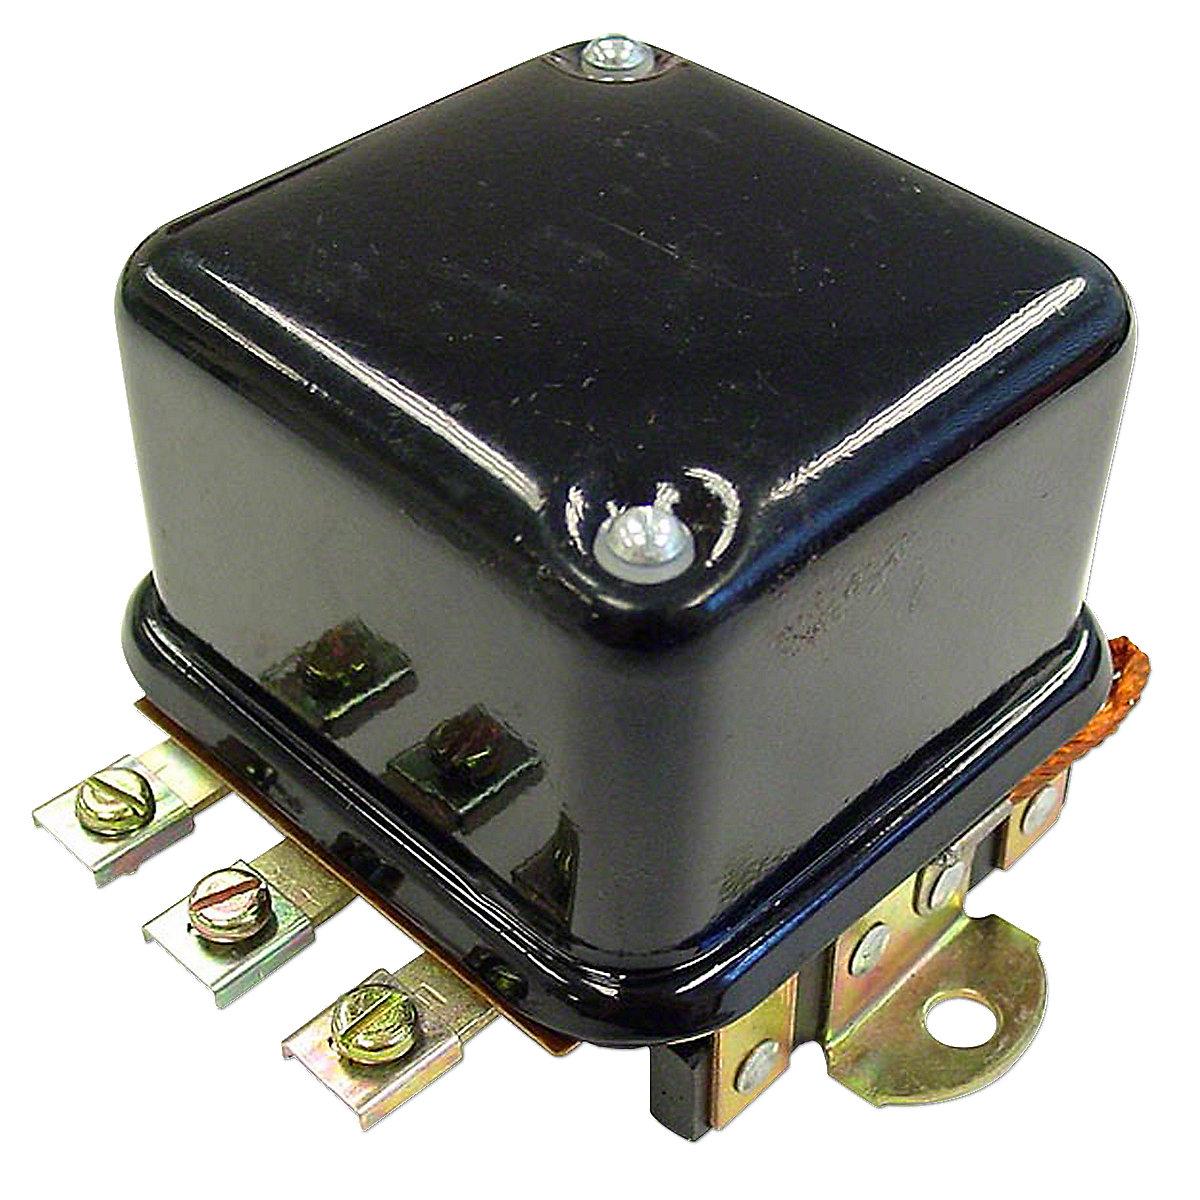 6 Volt External Voltage Regulator For Allis Chalmers: D10, D12, D14.